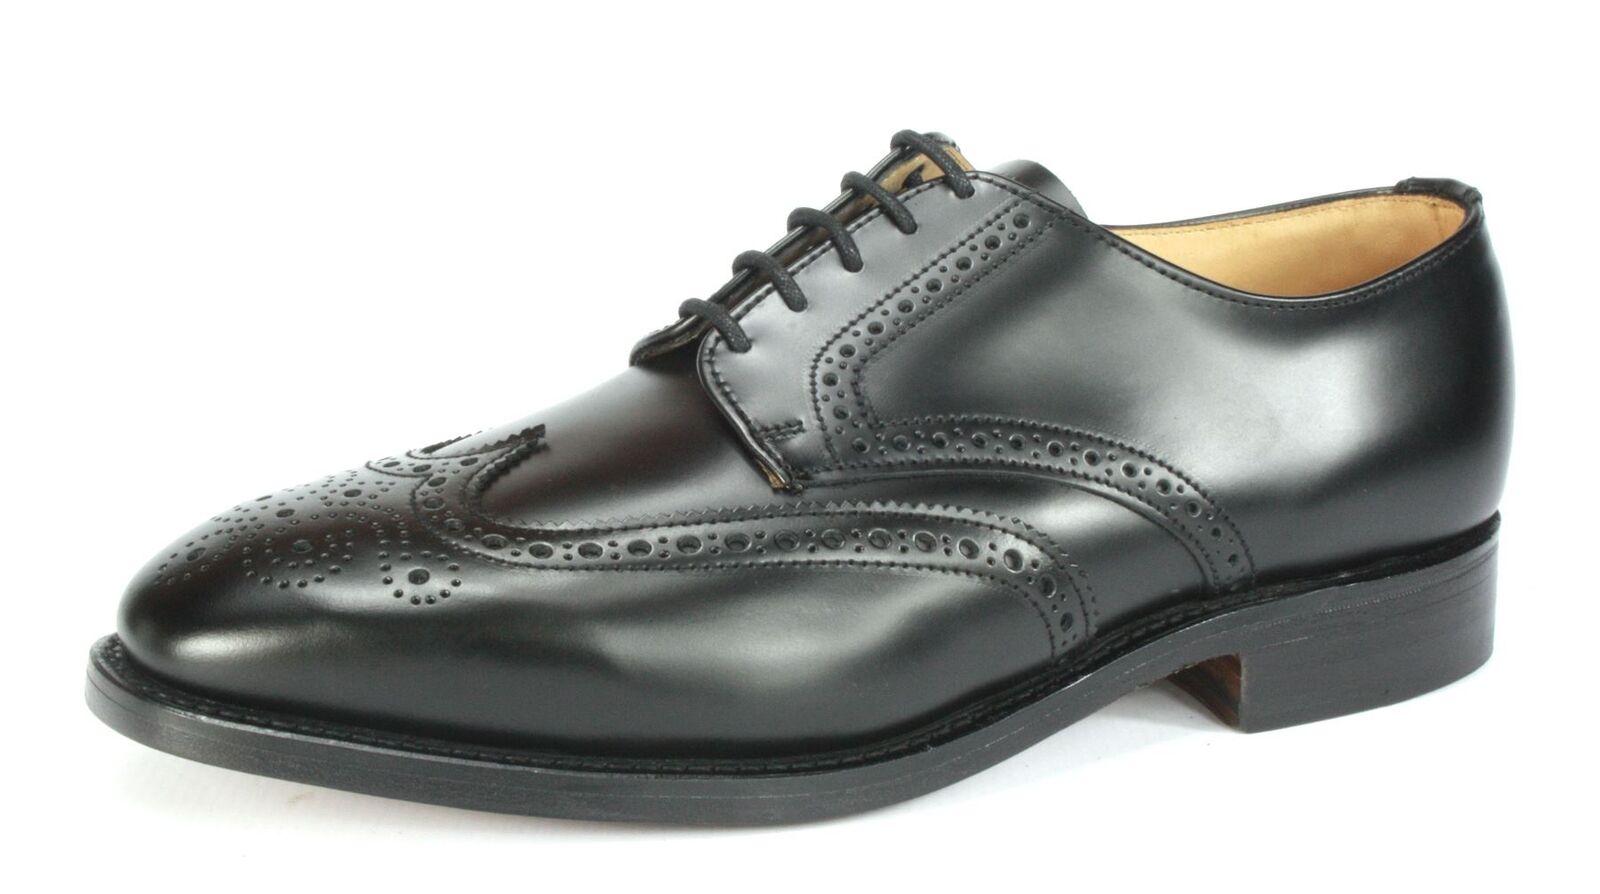 Charles  Horrel Brish Handmade Welted Mens Winspit Leather Brogue scarpe nero  per offrirti un piacevole shopping online